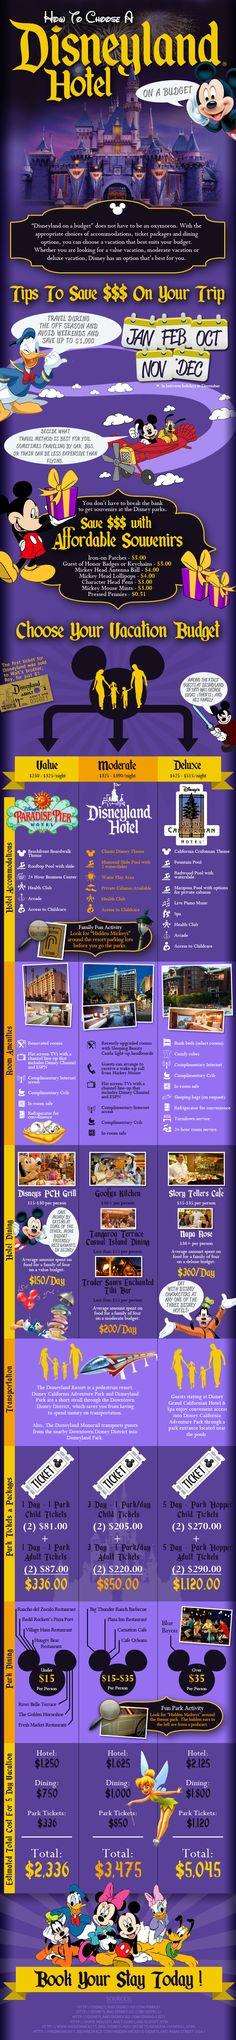 Choosing Disneyland Hotels on a Budget